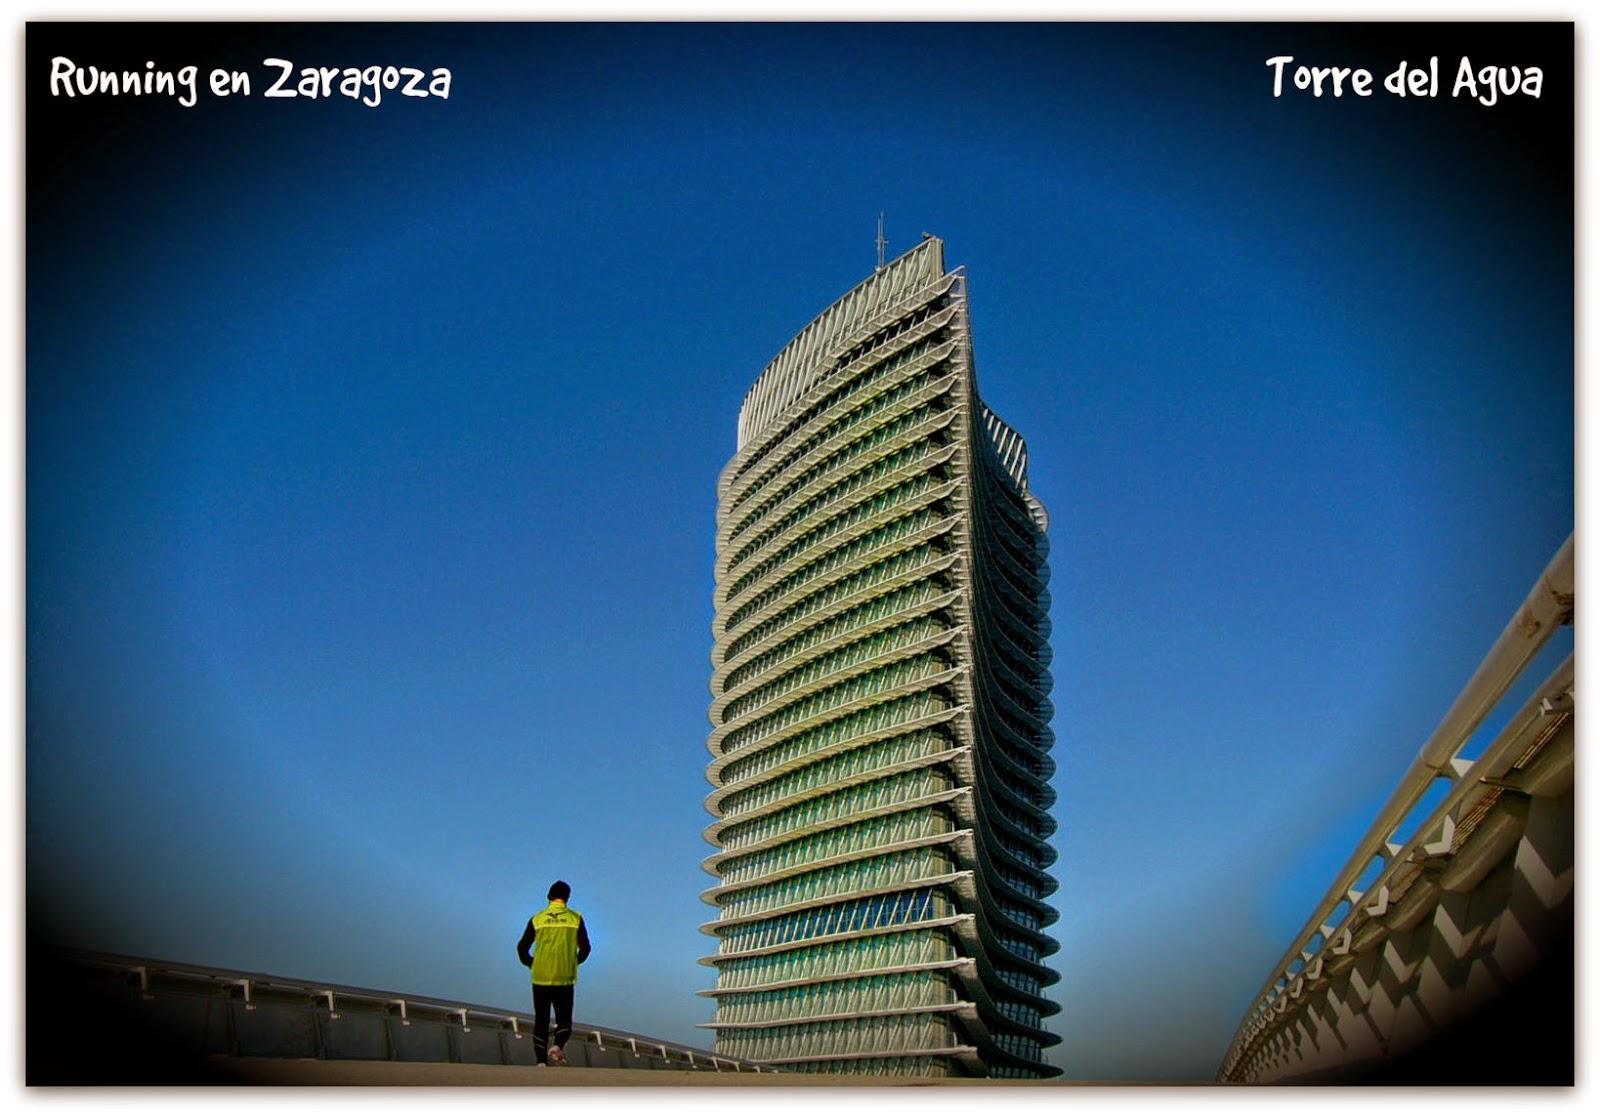 Circuito Zaragoza : Running en zaragoza circuito nº parque del agua